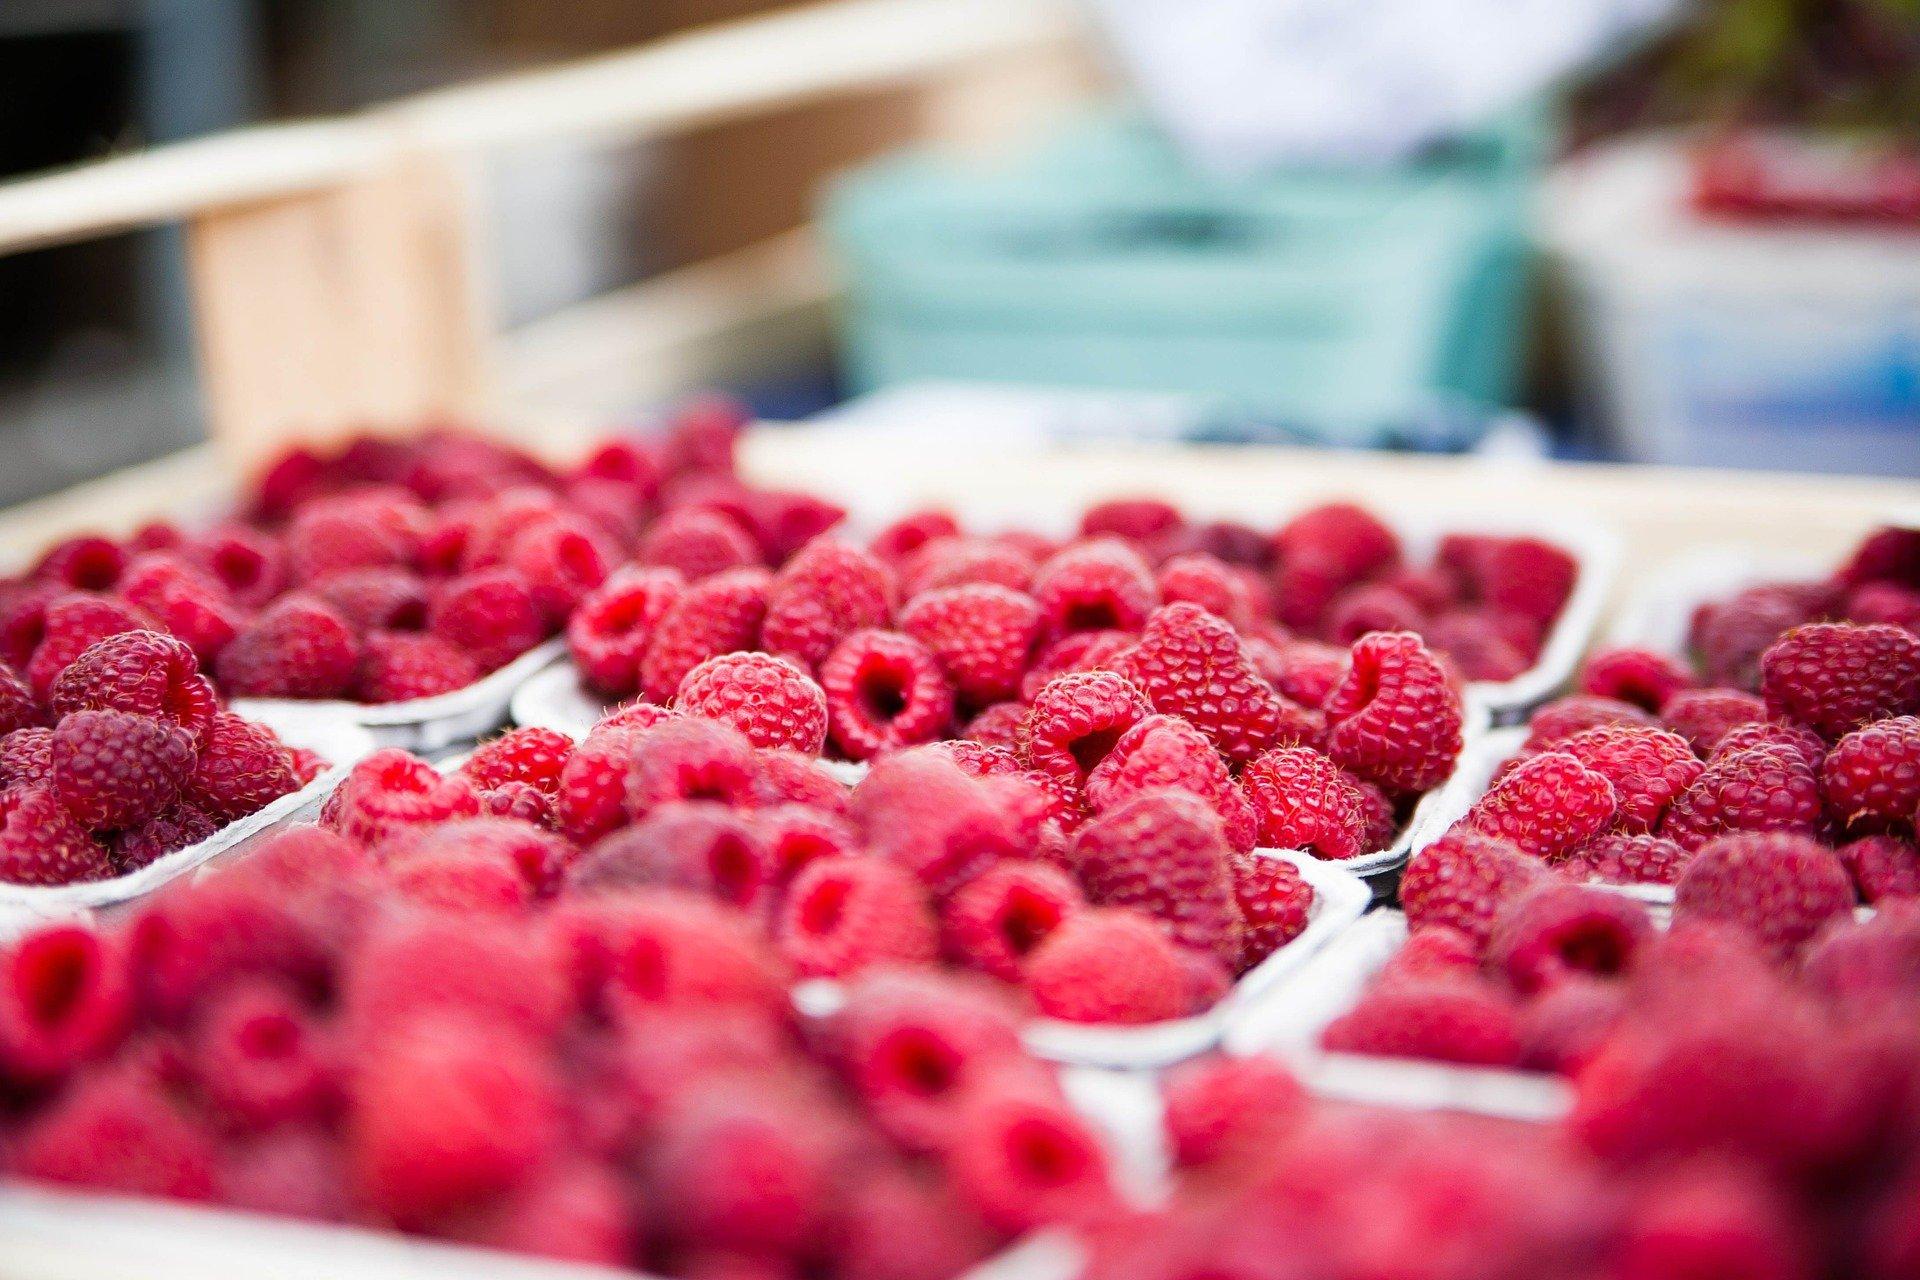 raspberries-422979_1920